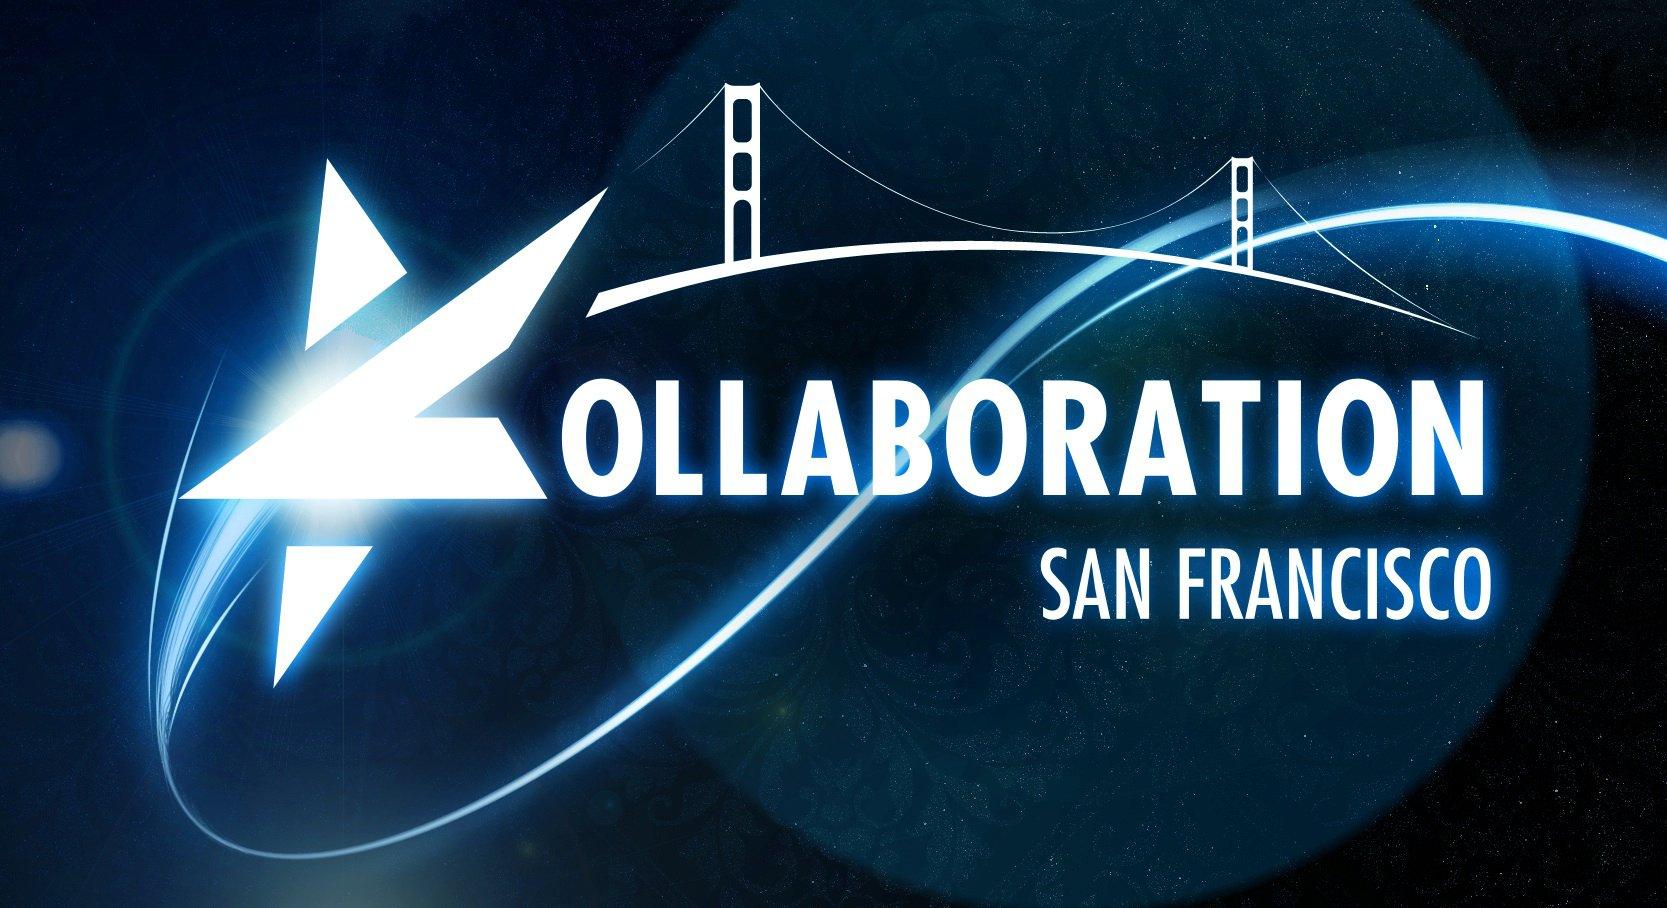 kollaboration_sf.jpeg